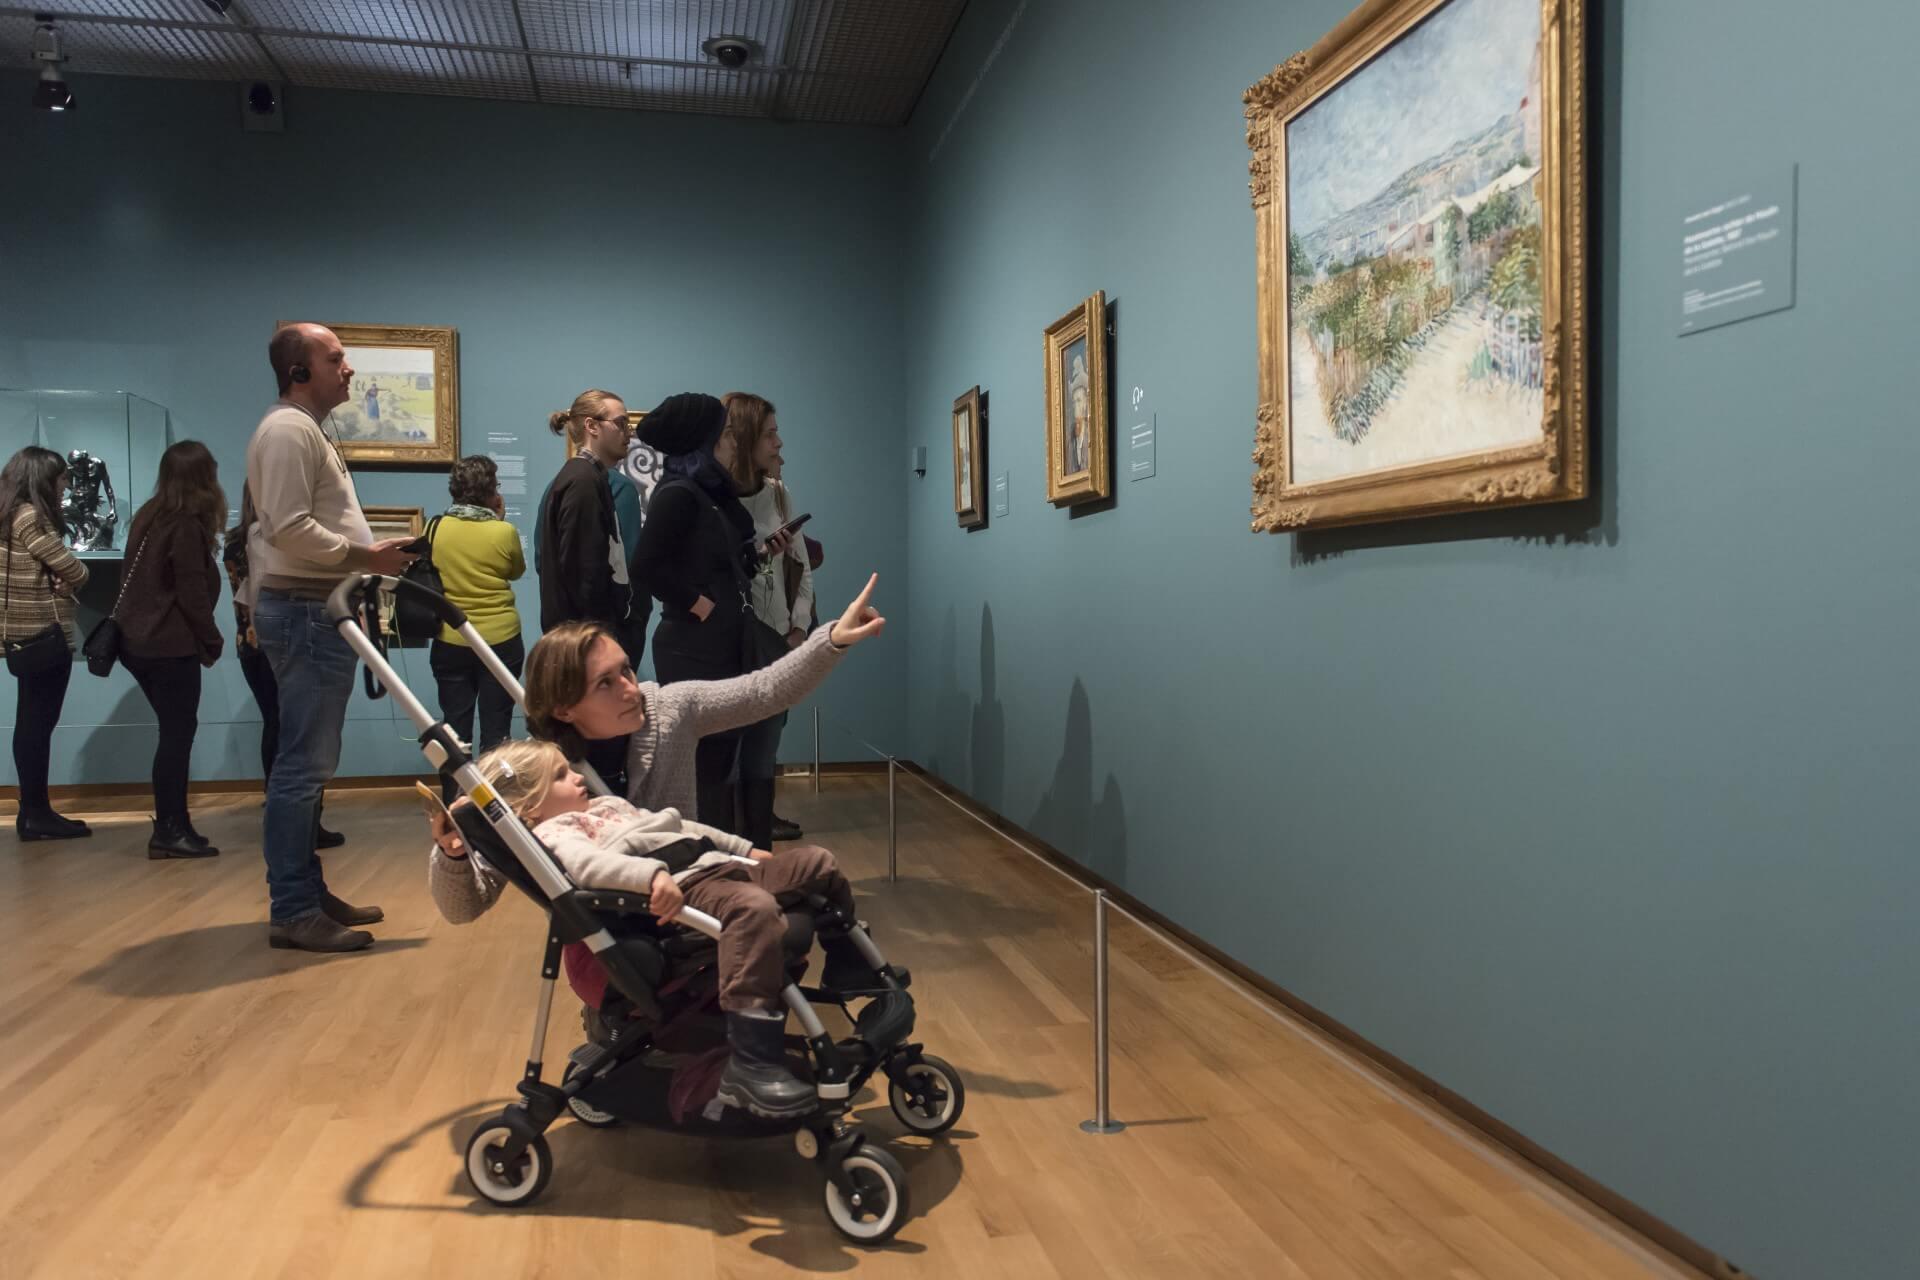 Family Friendly Van Gogh Museum